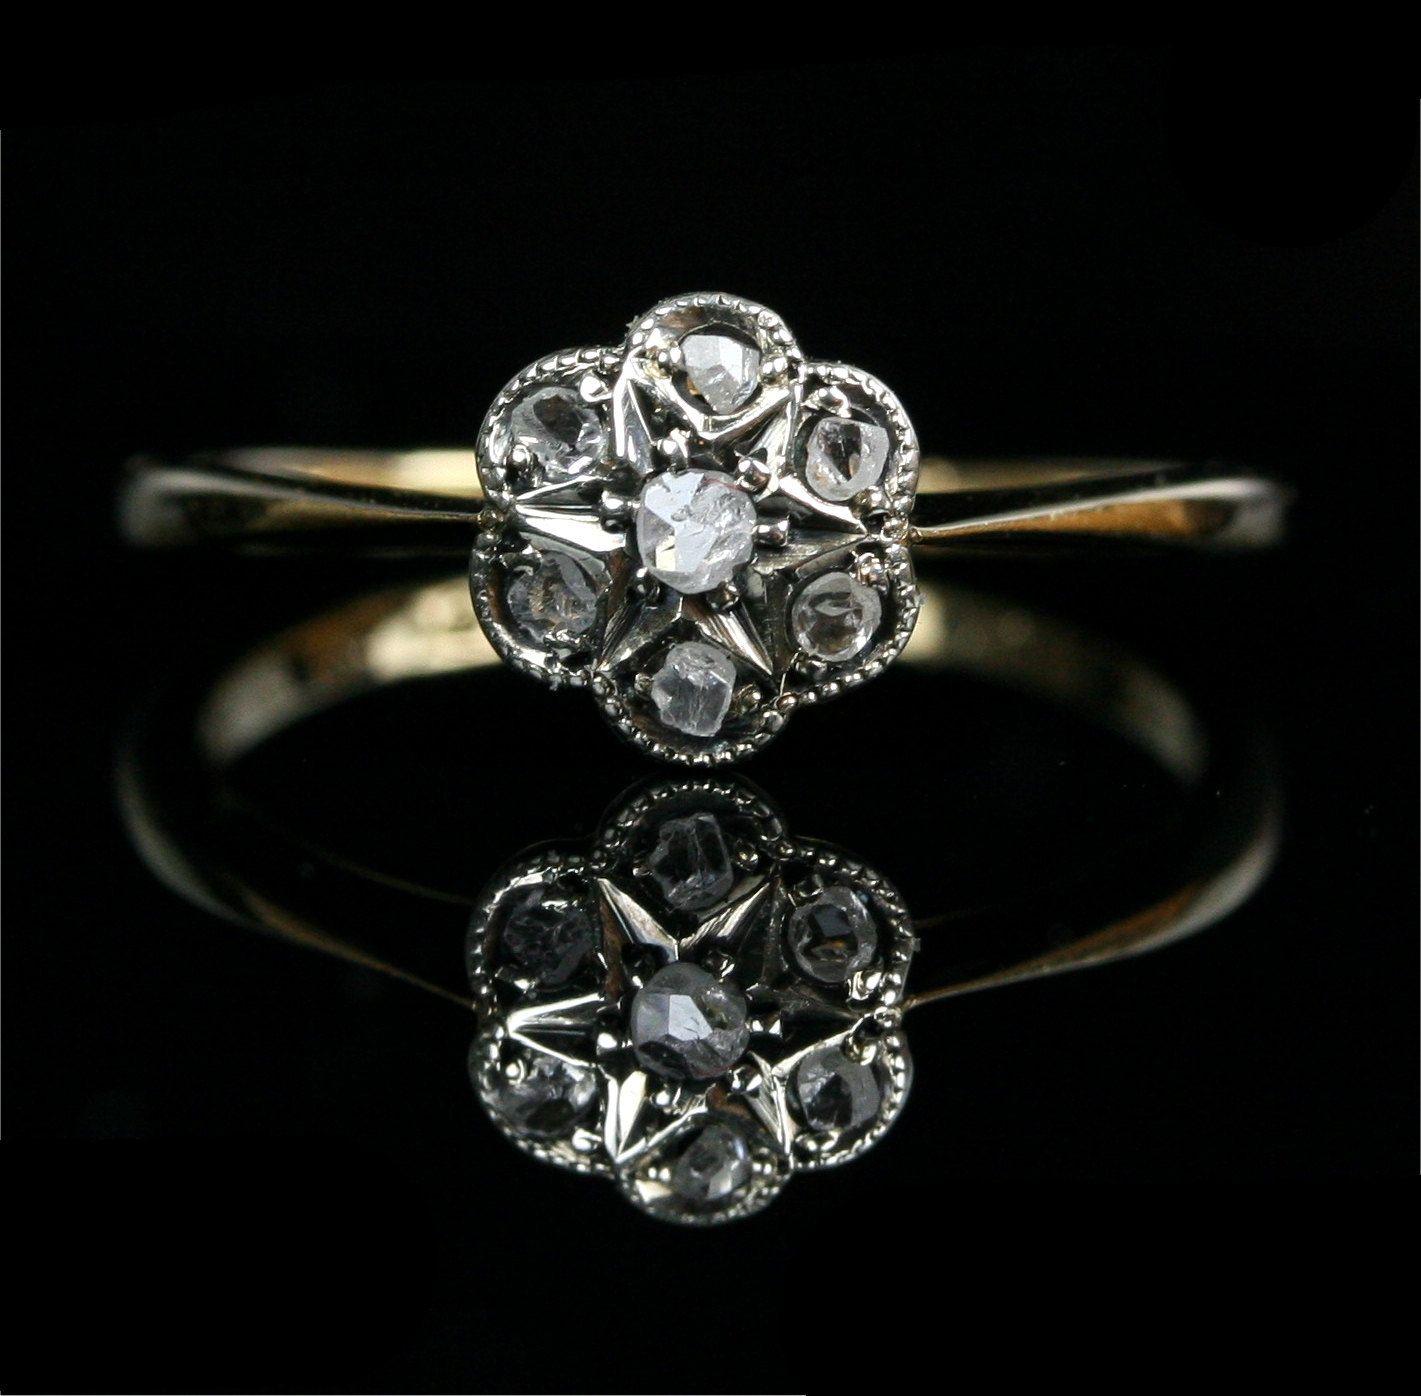 flower wedding ring Early Victorian 18k Gold Rose Cut Diamond Flower Cluster Engagement Ring